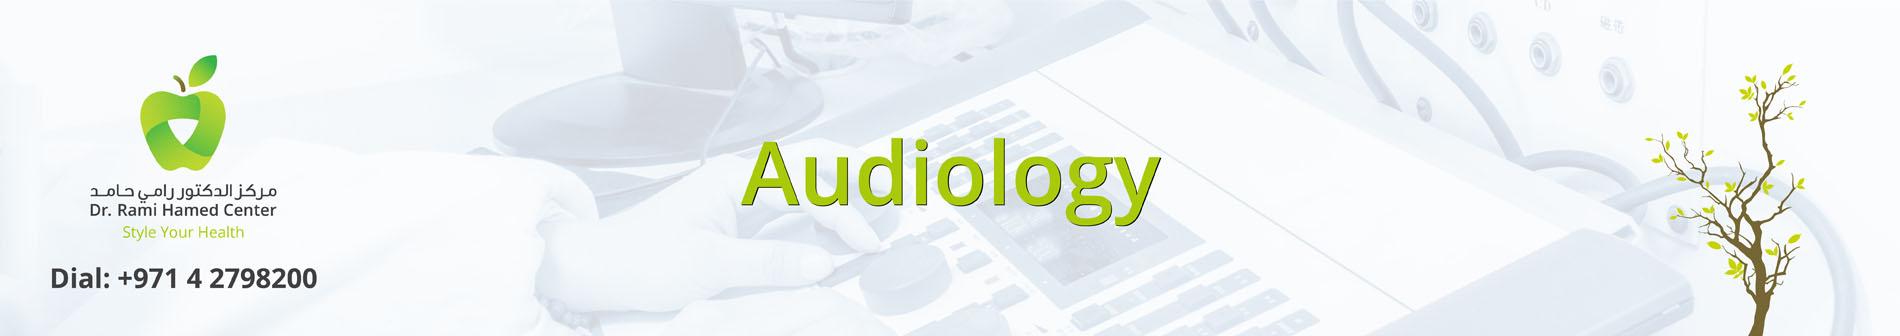 Dubai Audiology Clinic Speech Therapy